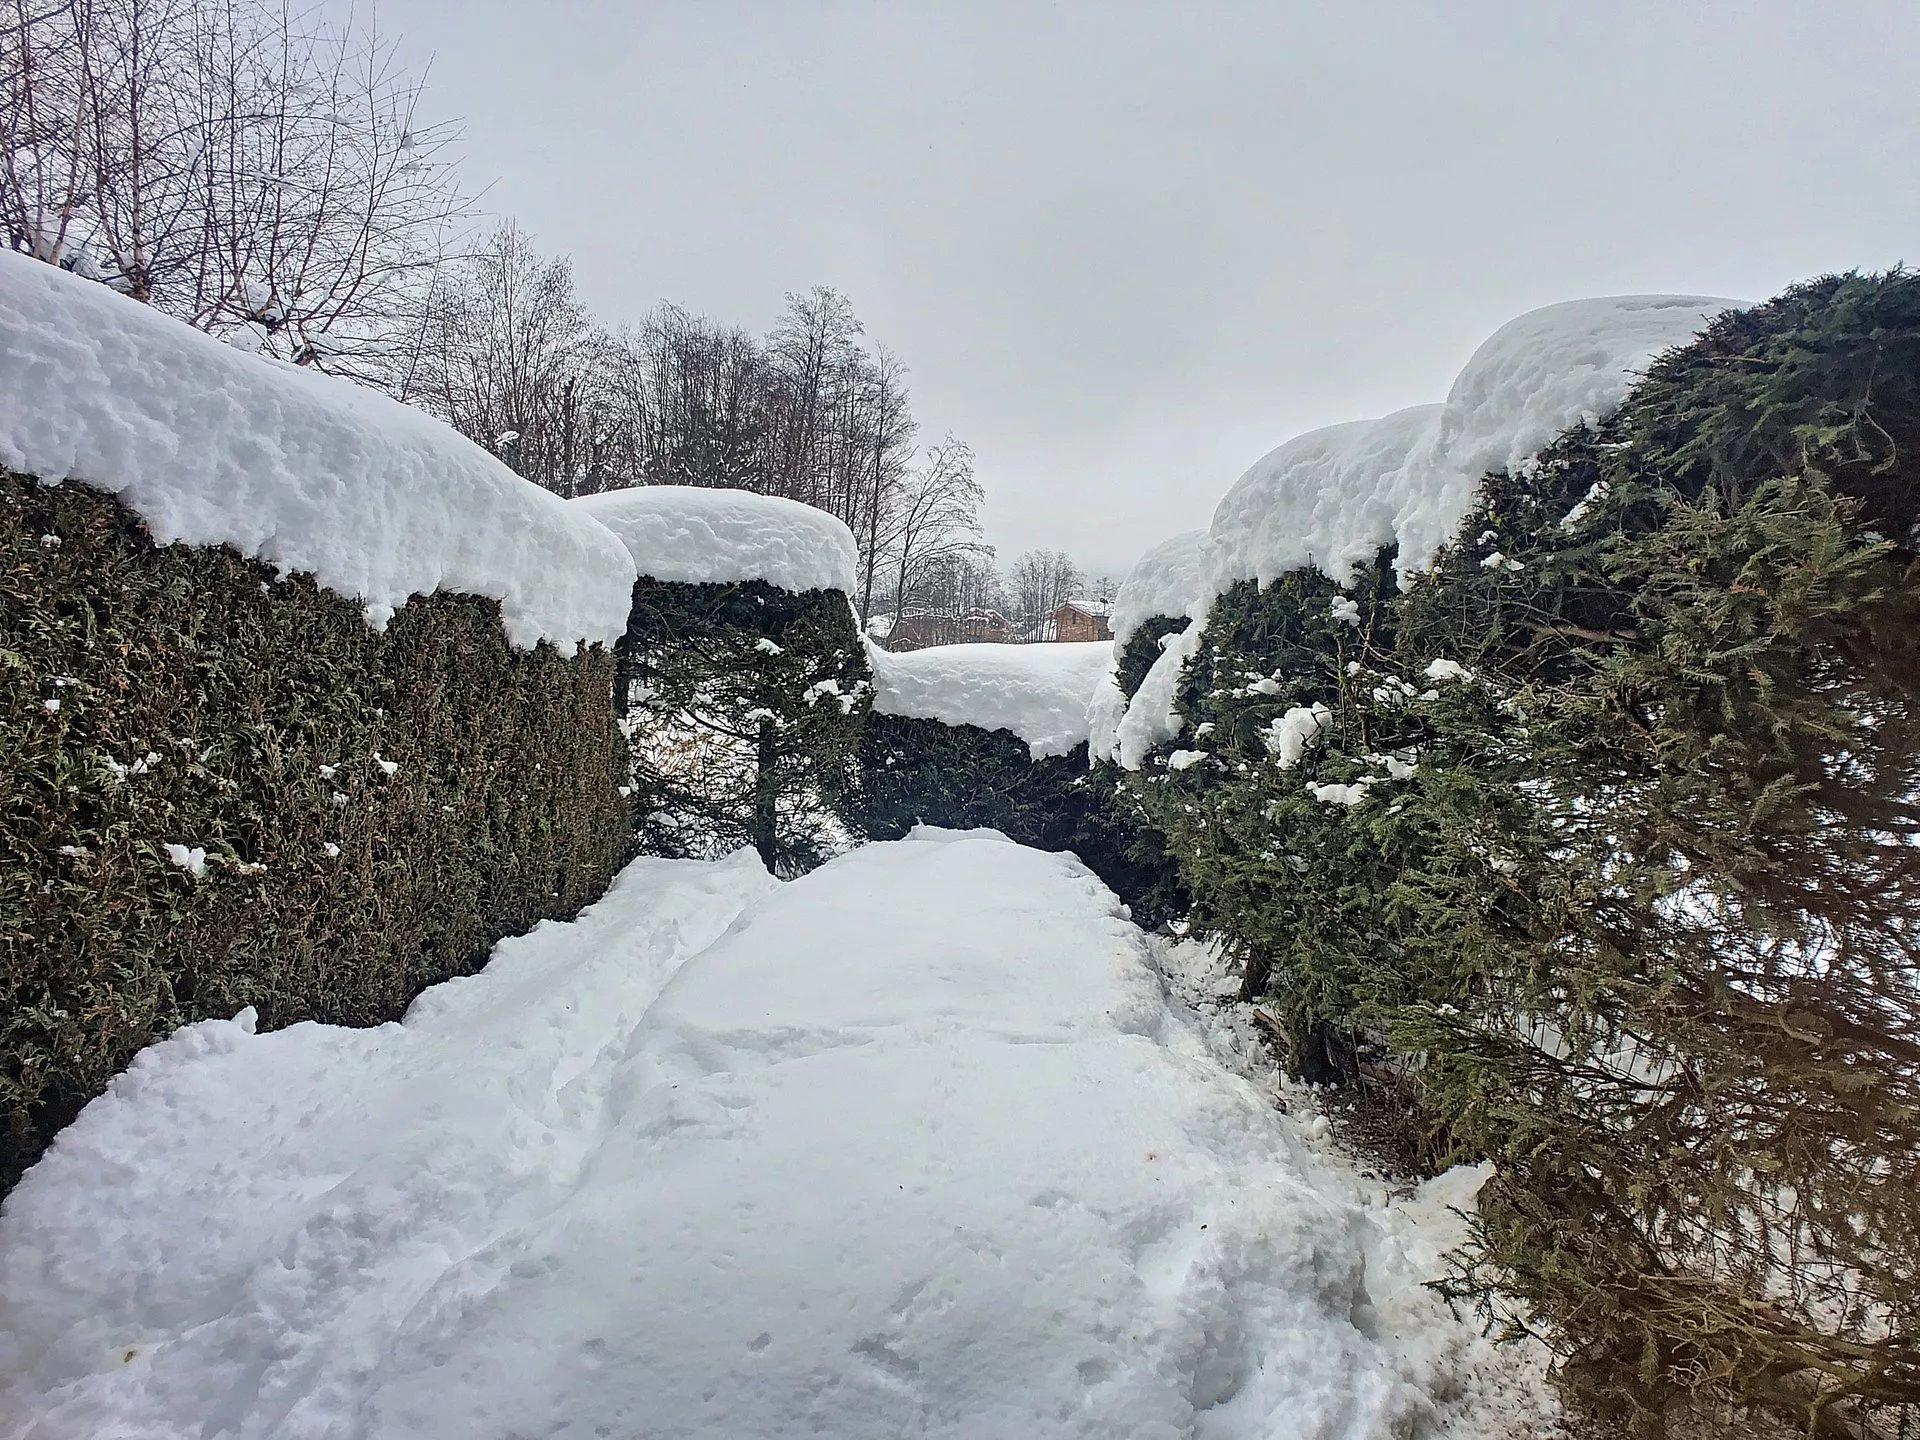 Studio giardino, Chamonix-Mont-Blanc